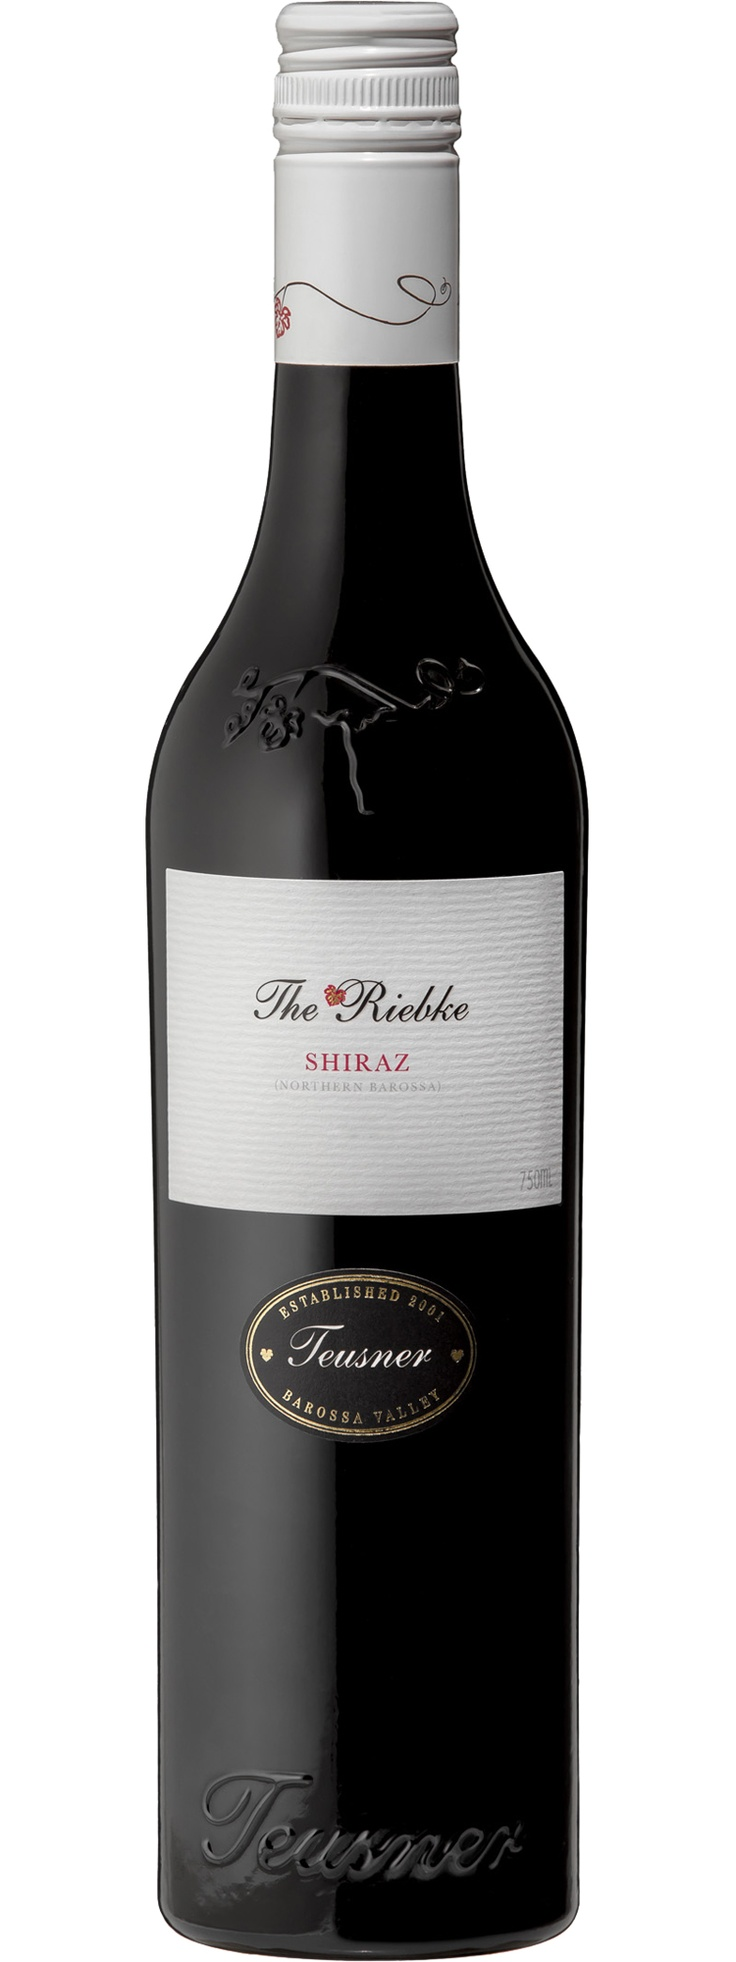 Teusner The Riebke Shiraz 2012 - great body, good Barossa shiraz!